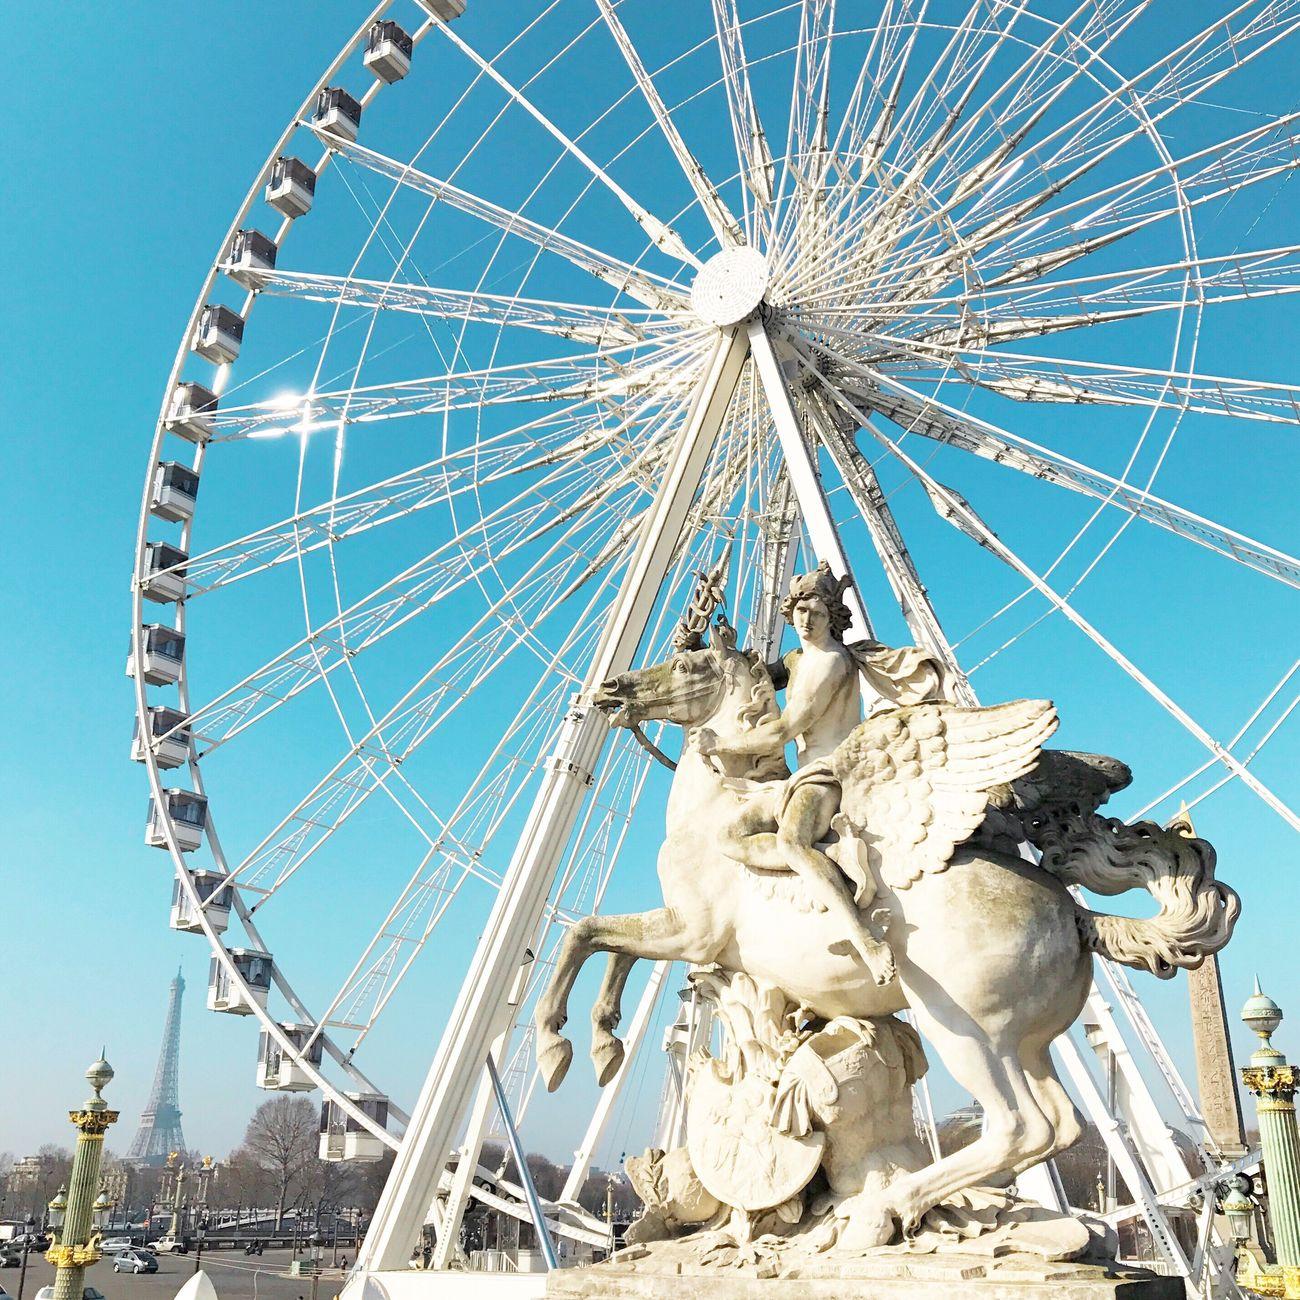 Bon week-end! Good morning Paris! Statue Sculpture Ferris Wheel Clear Sky Paris ❤ Eyem Best Shot - Architecture Photooftheday EyeEm Best Shots Paris Parisweloveyou Architecture